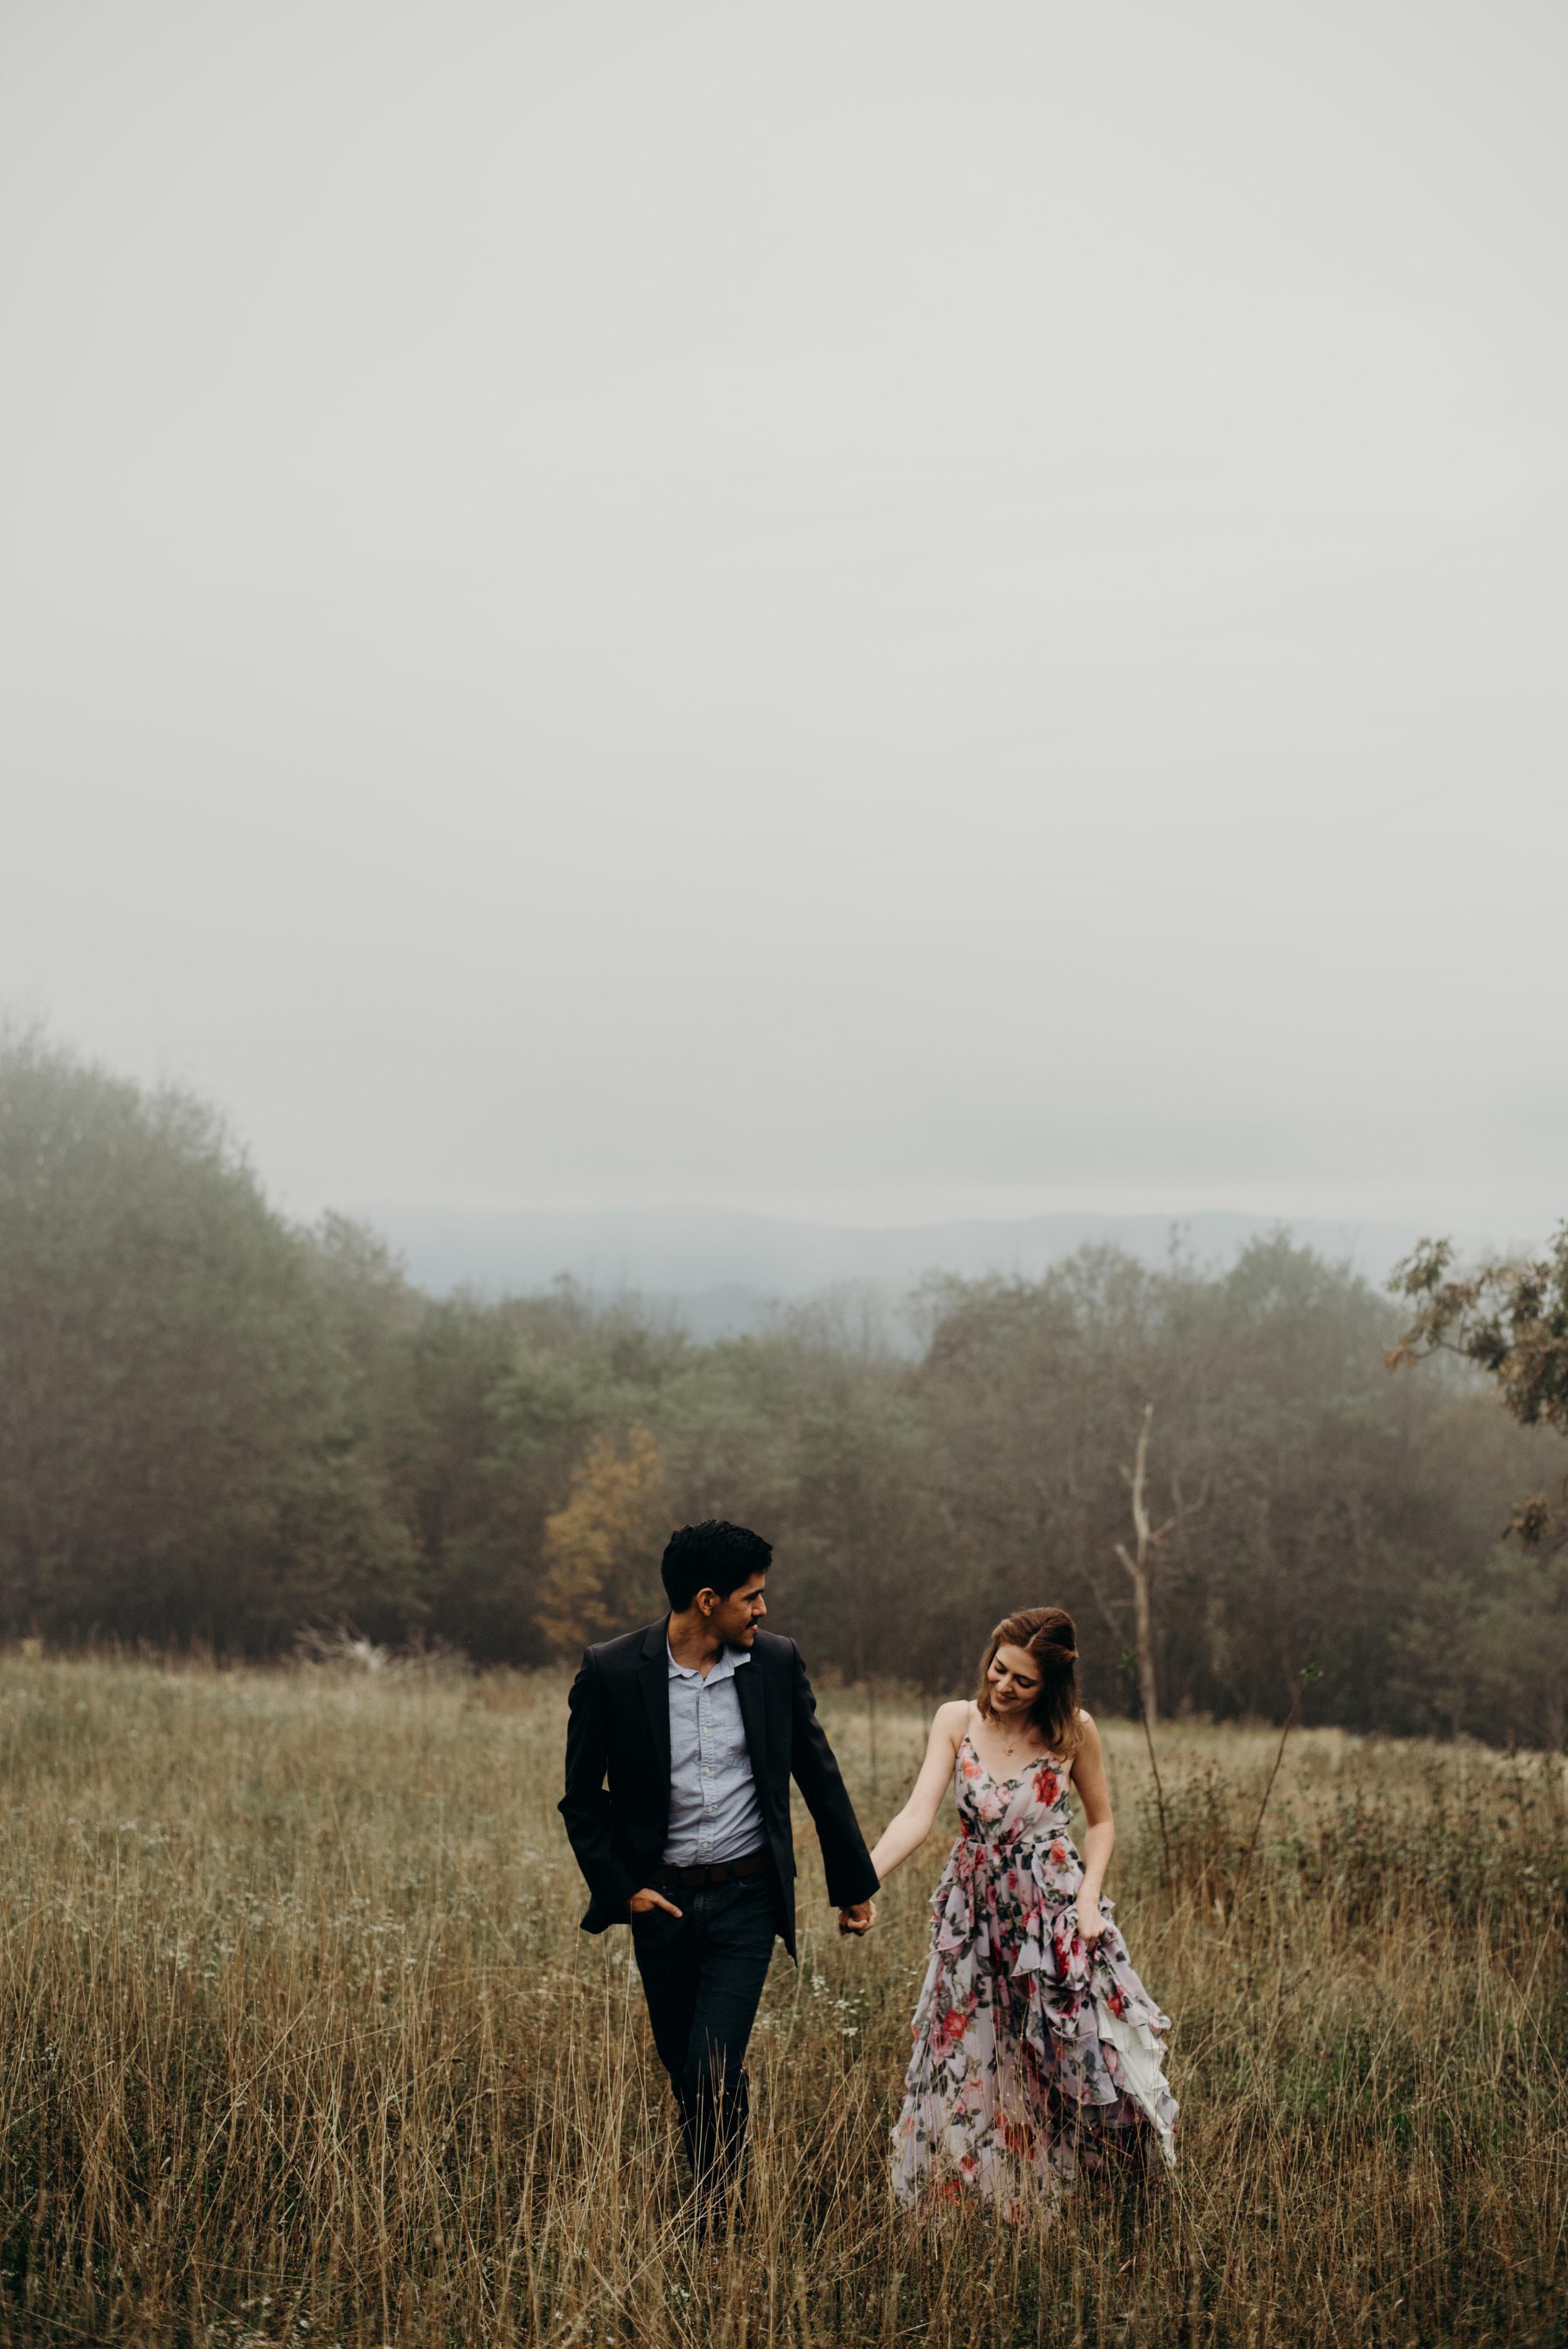 alvaro-sasha-skyline-drive-engagement-session-virginia-wedding-photographer-lindsey-paradiso-8473.jpg